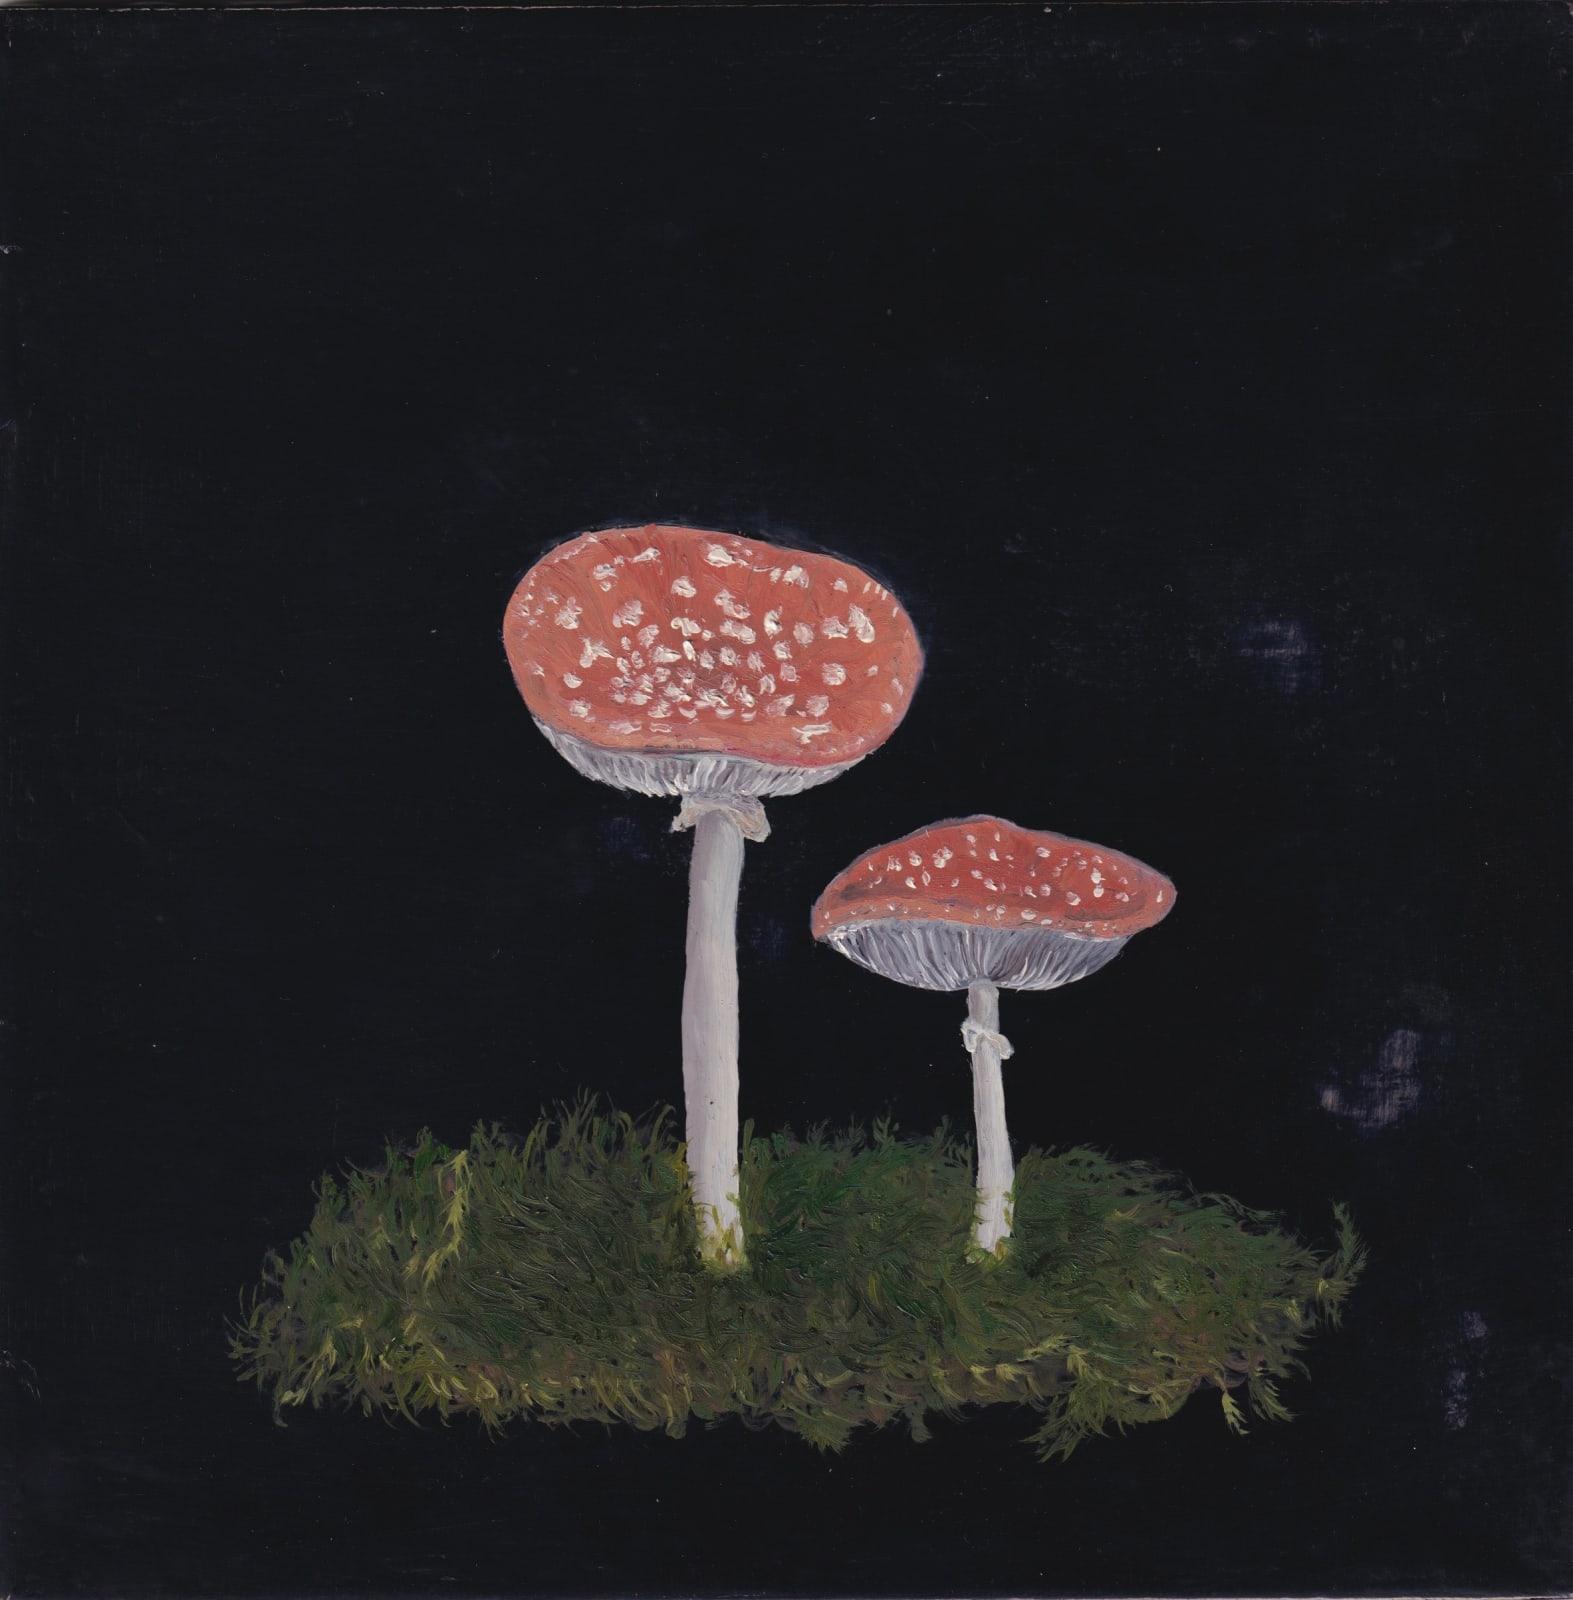 Melanie Miller, Fungi II, 2020